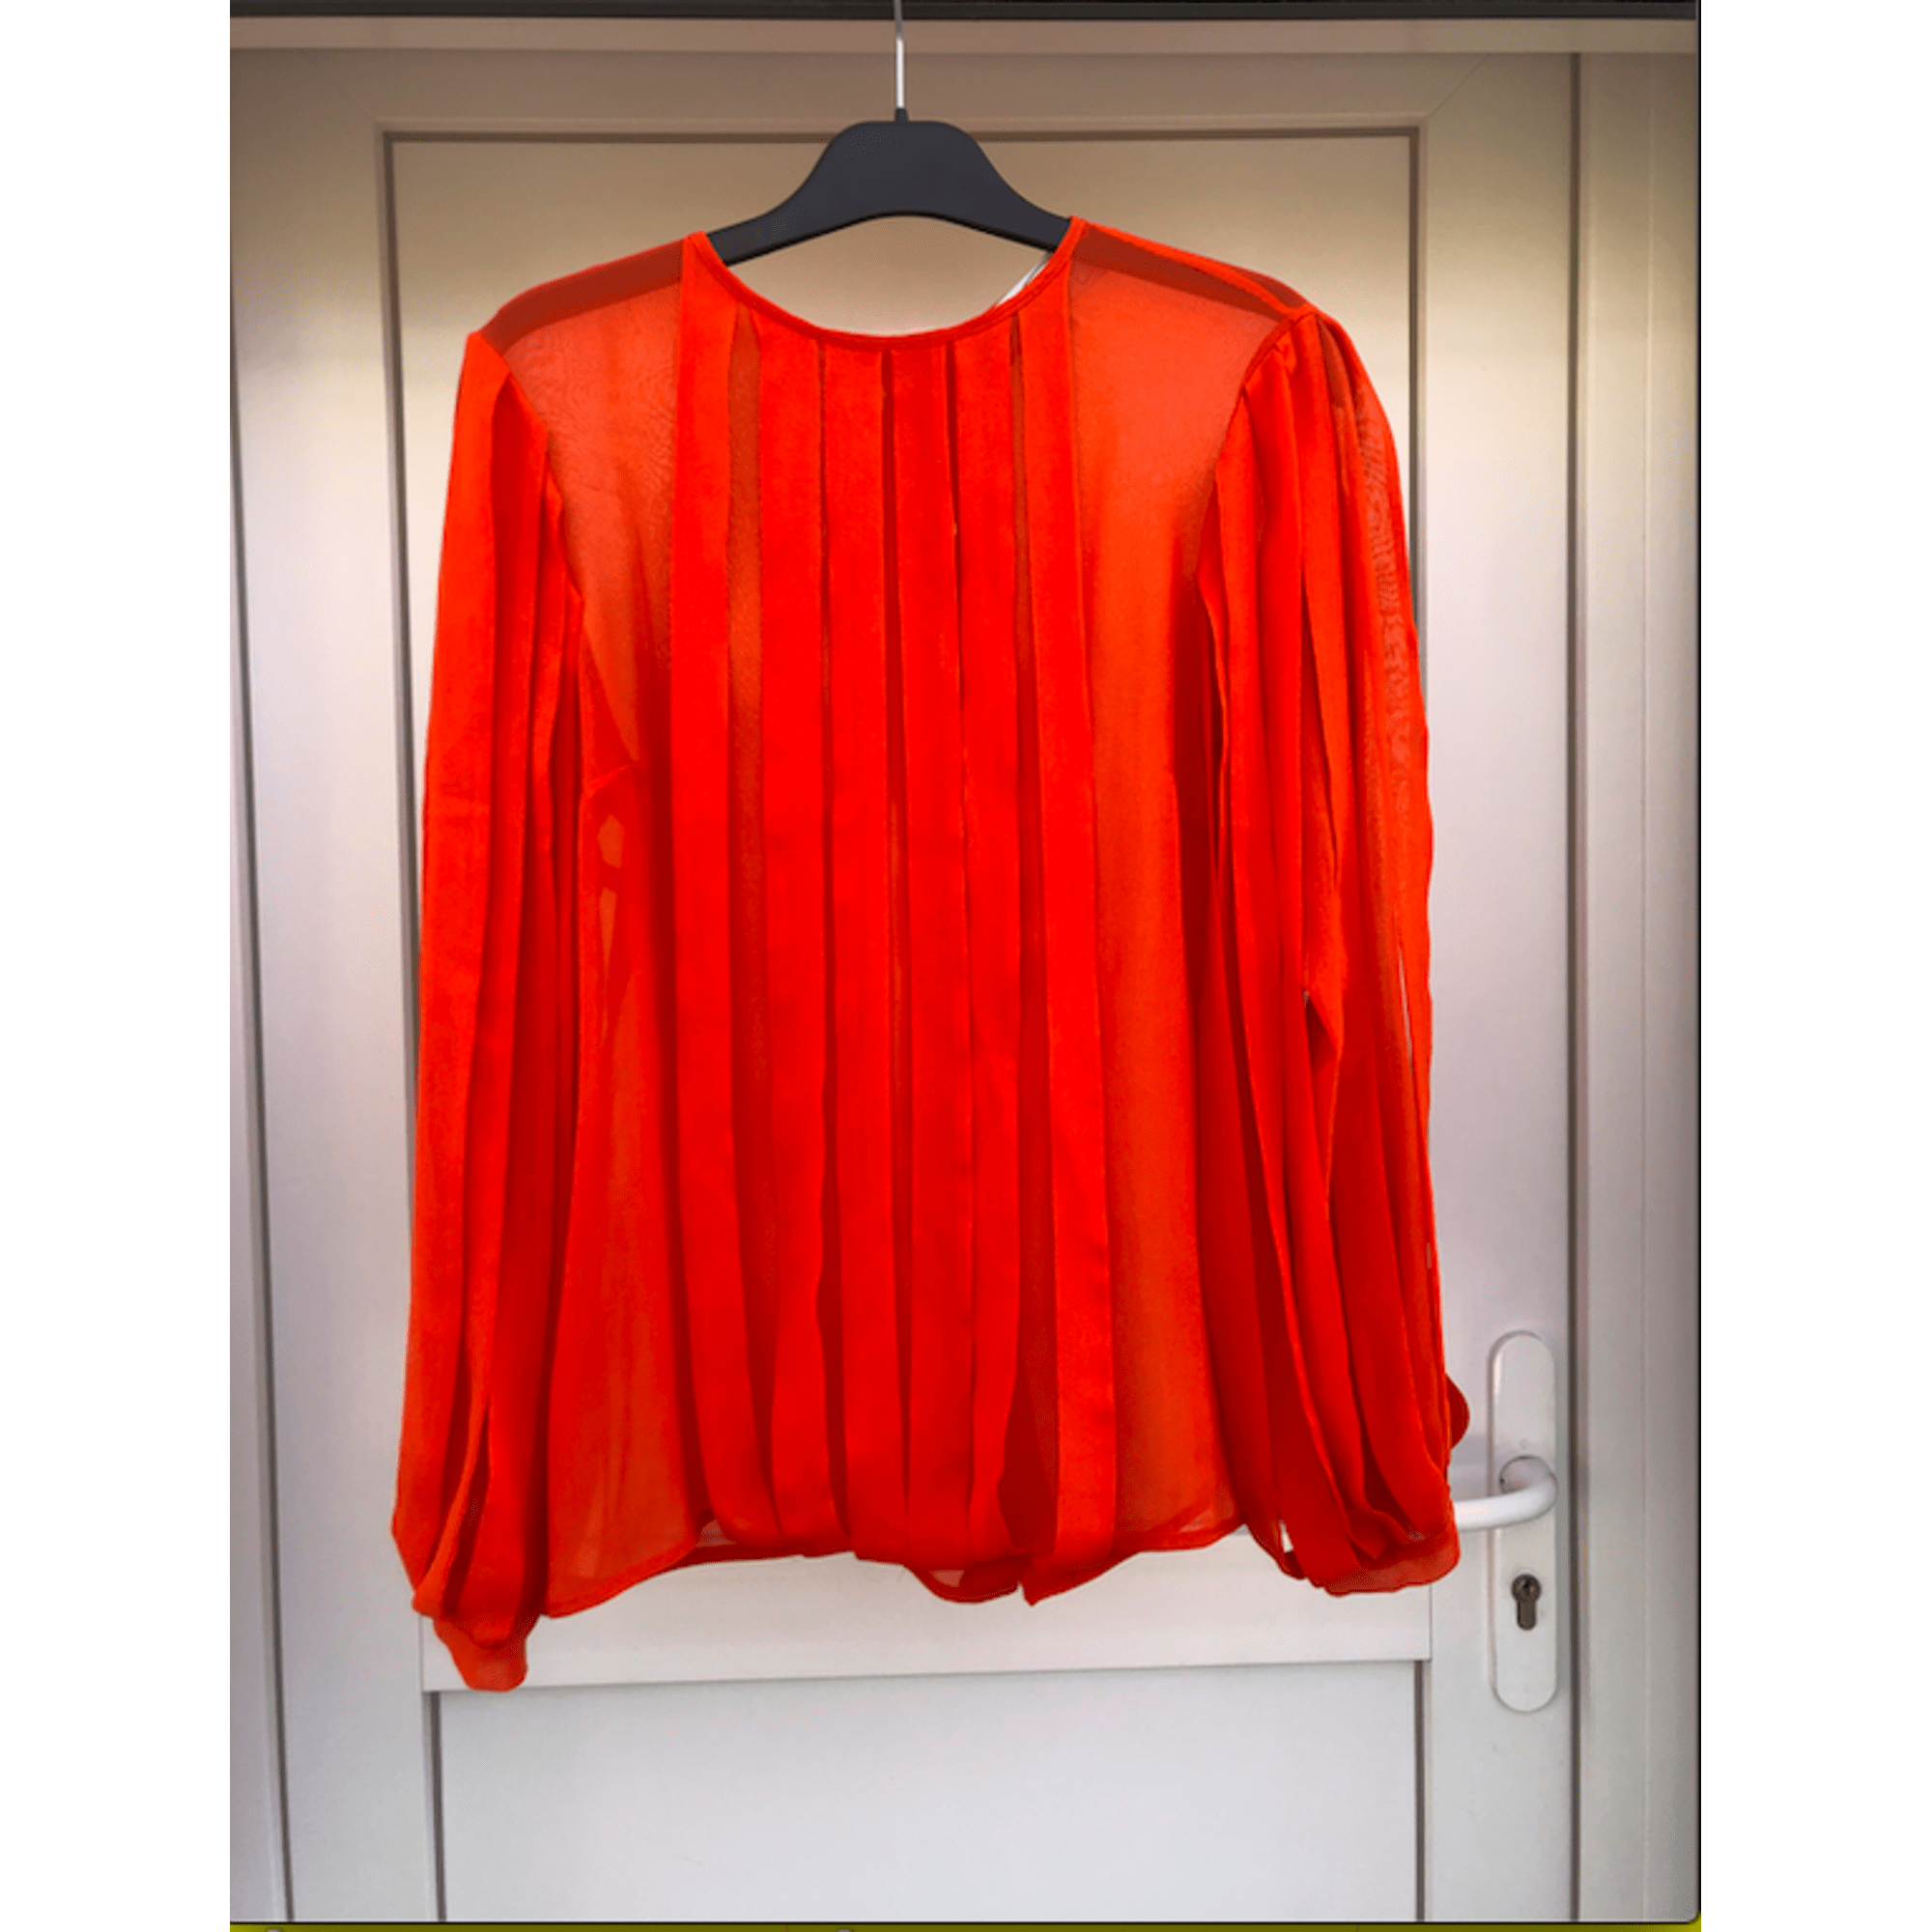 Blouse BELLE OF LONDON Orange